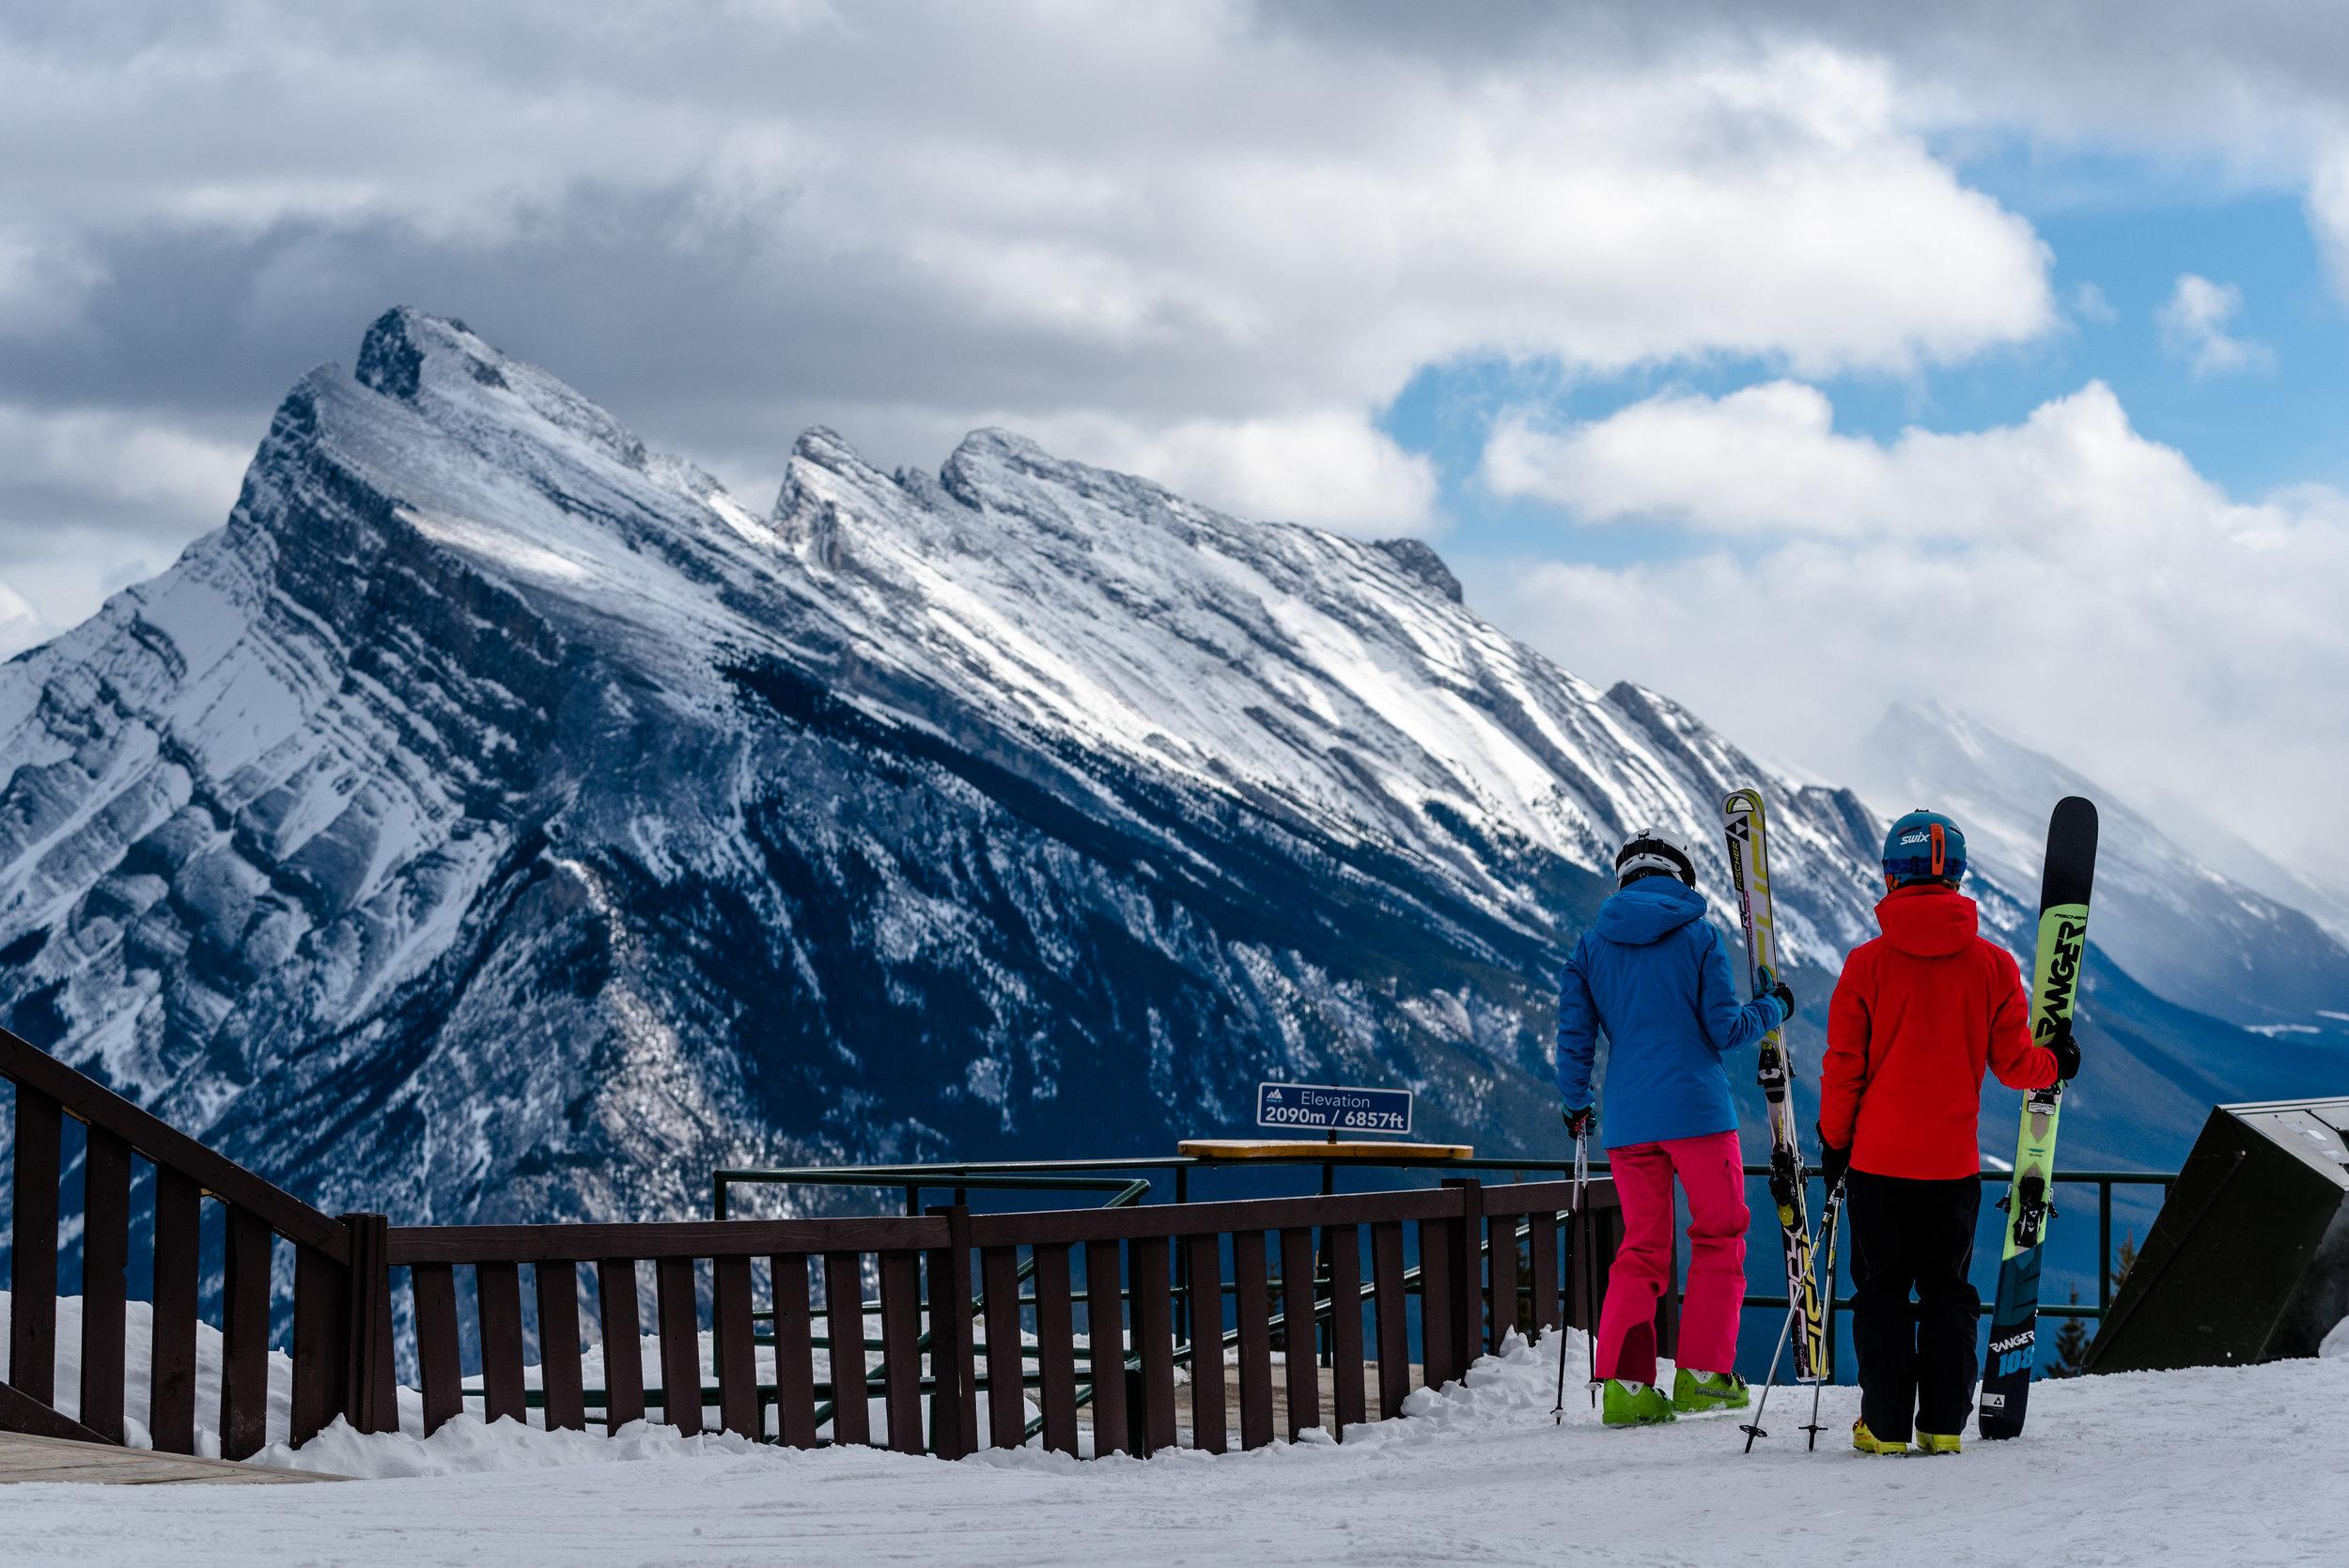 Ski_Snowboard_Norquay_2016_Reuben_Krabbe_1_Horizontal.jpg